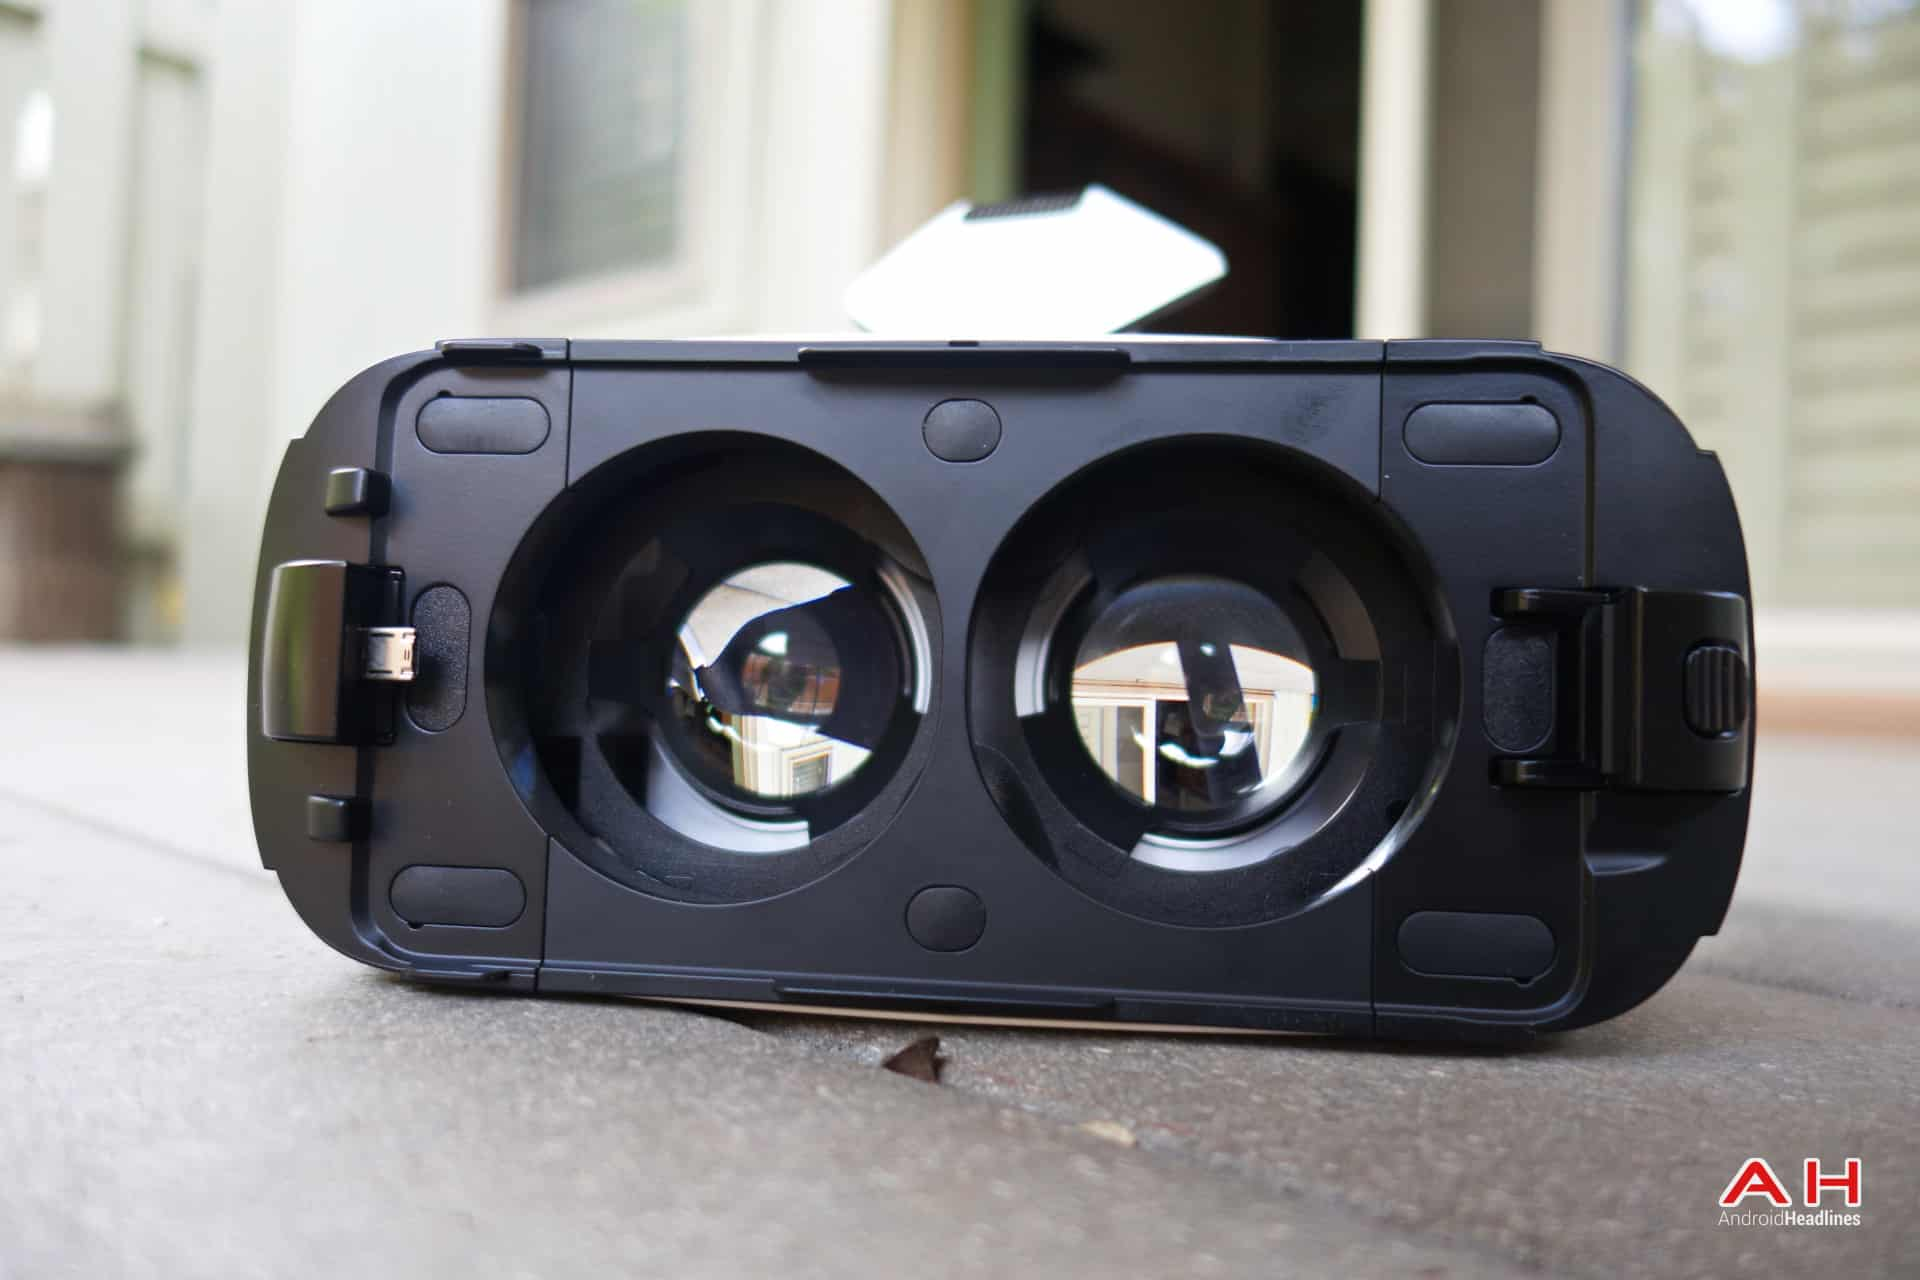 AH Samsung Gear VR 19